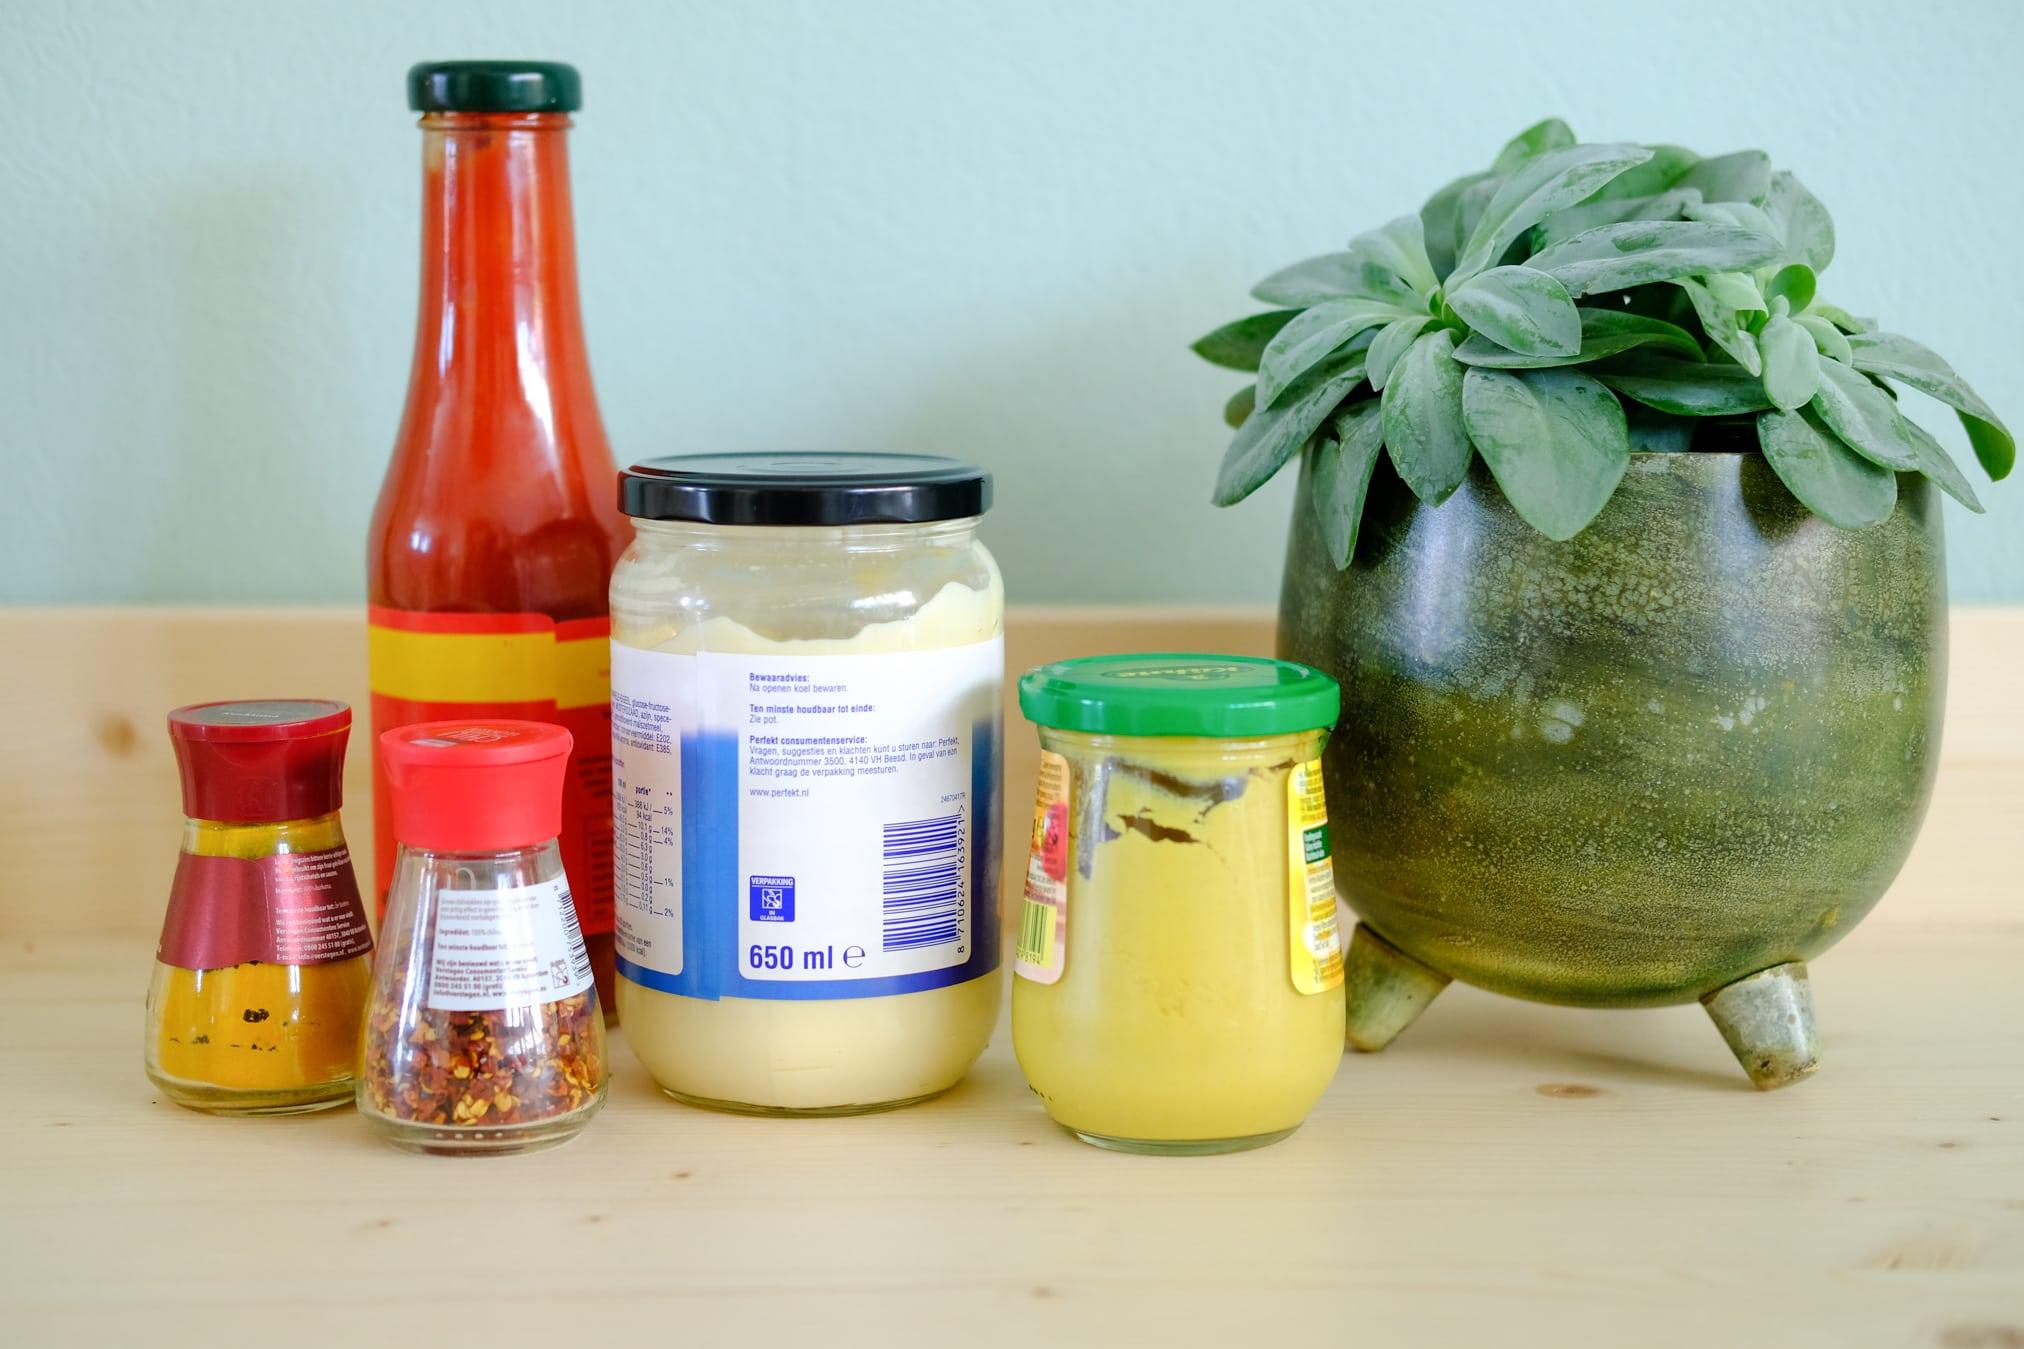 leven zonder afval keuken